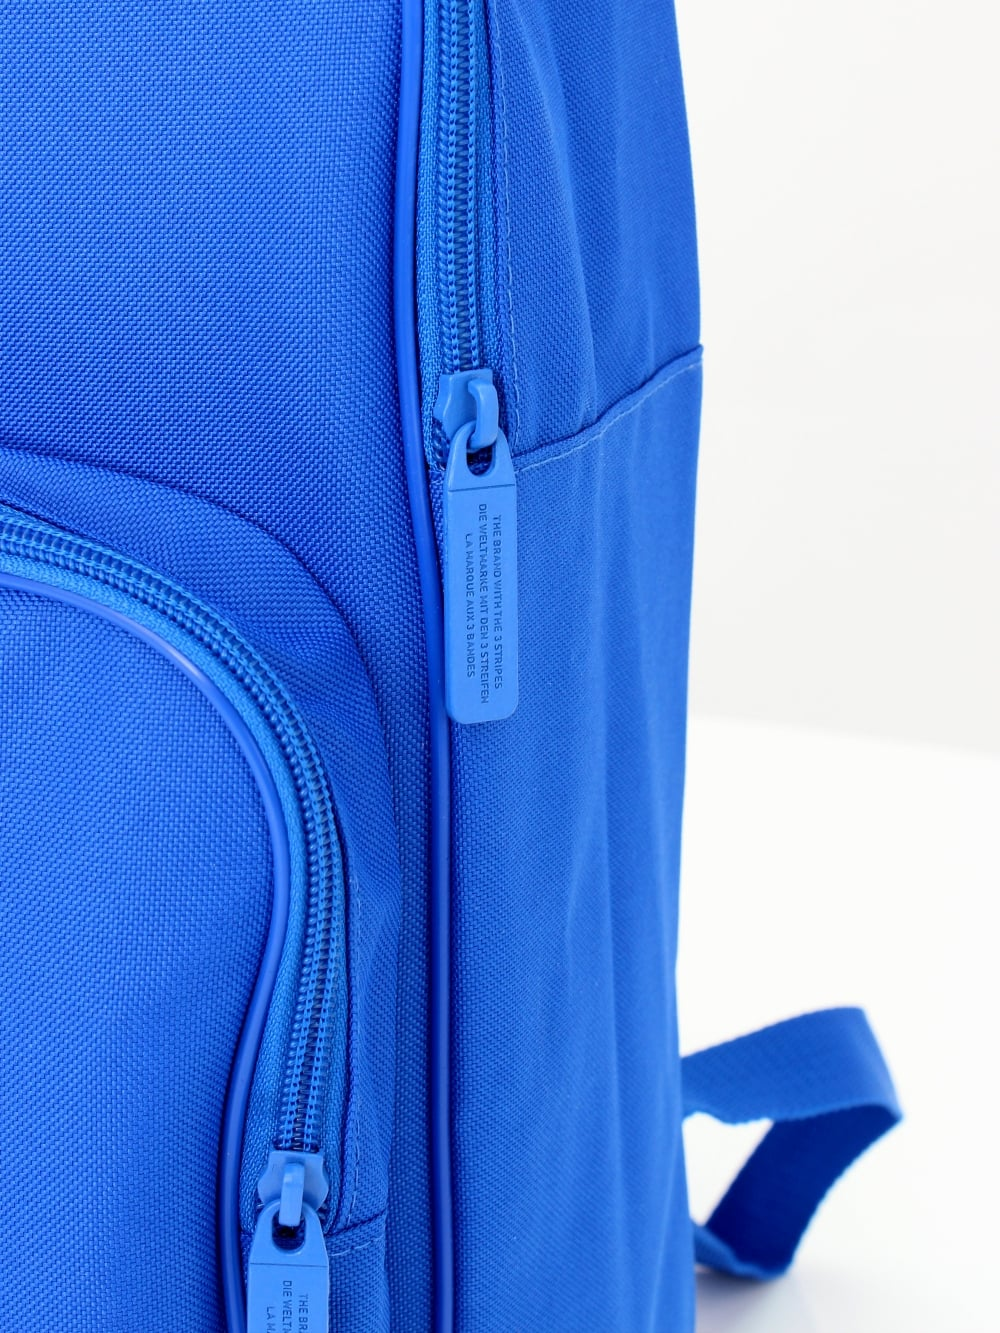 3990567e9709 adidas Originals Trefoil Backpack in Blue